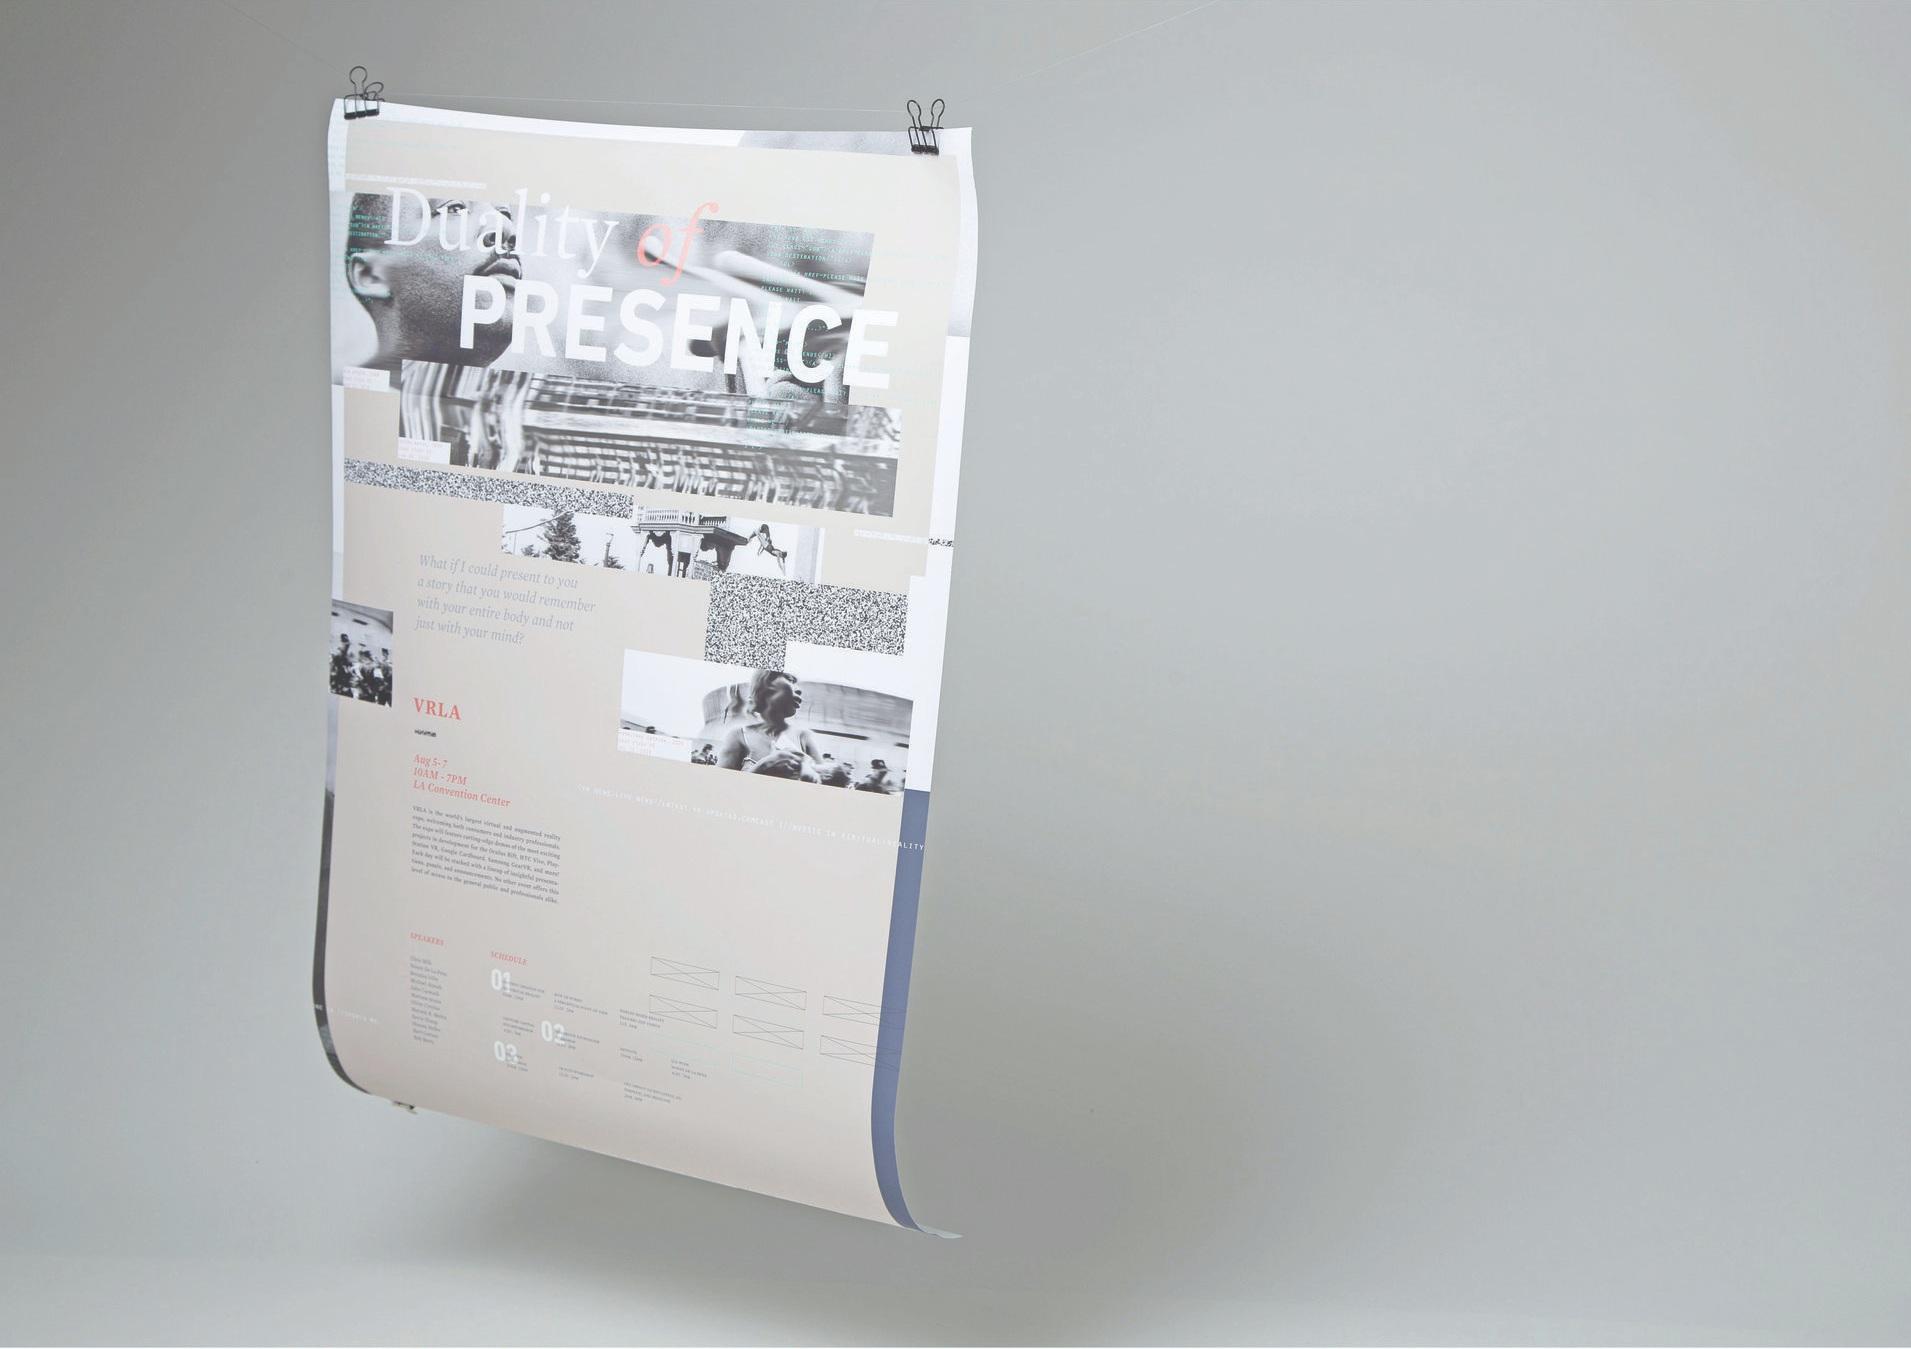 Aldrich-portfolio-thumbnails22.jpg